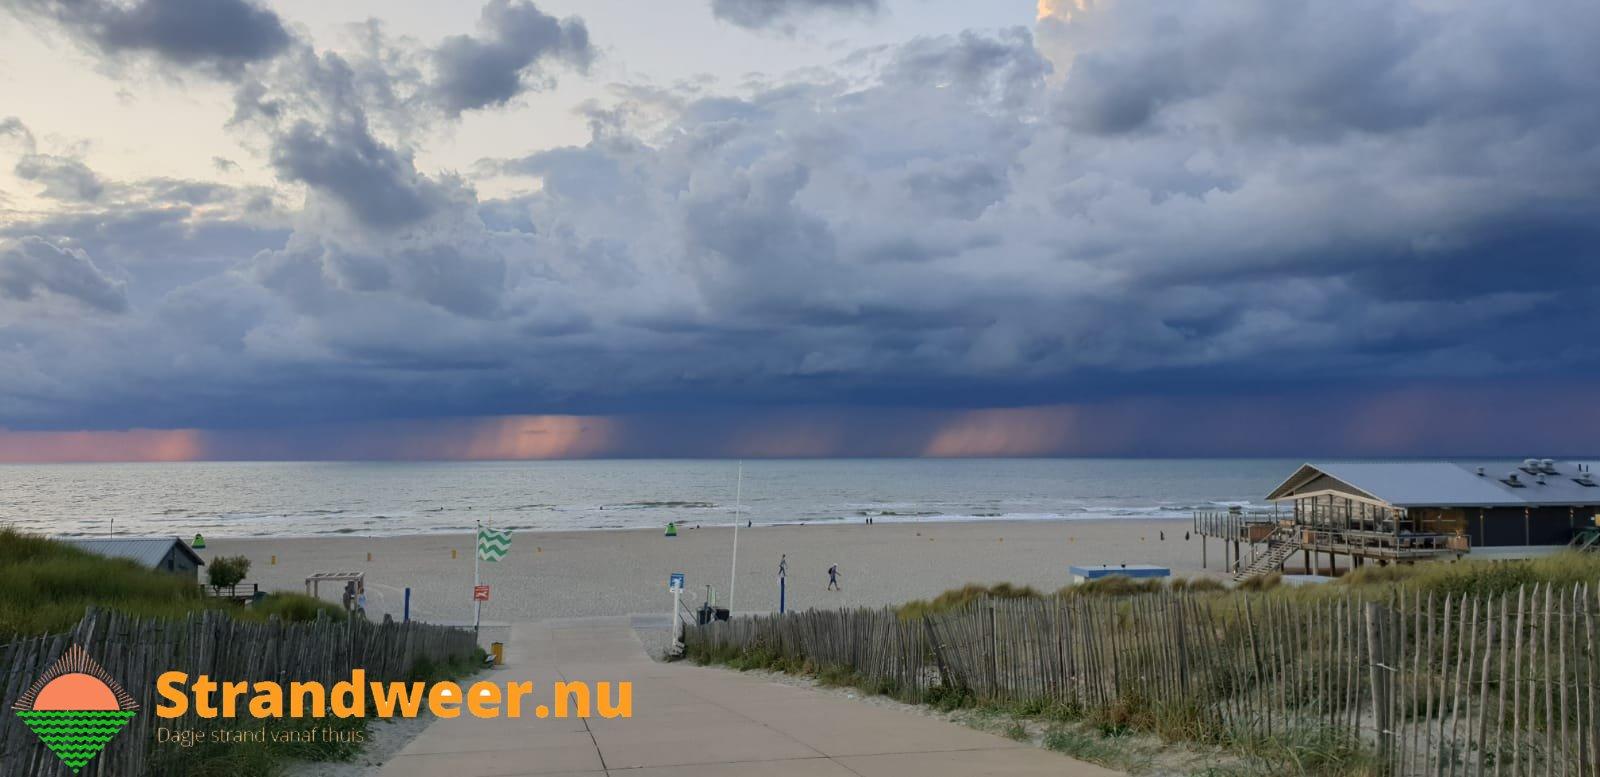 Het strandweer voor maandag 2 september